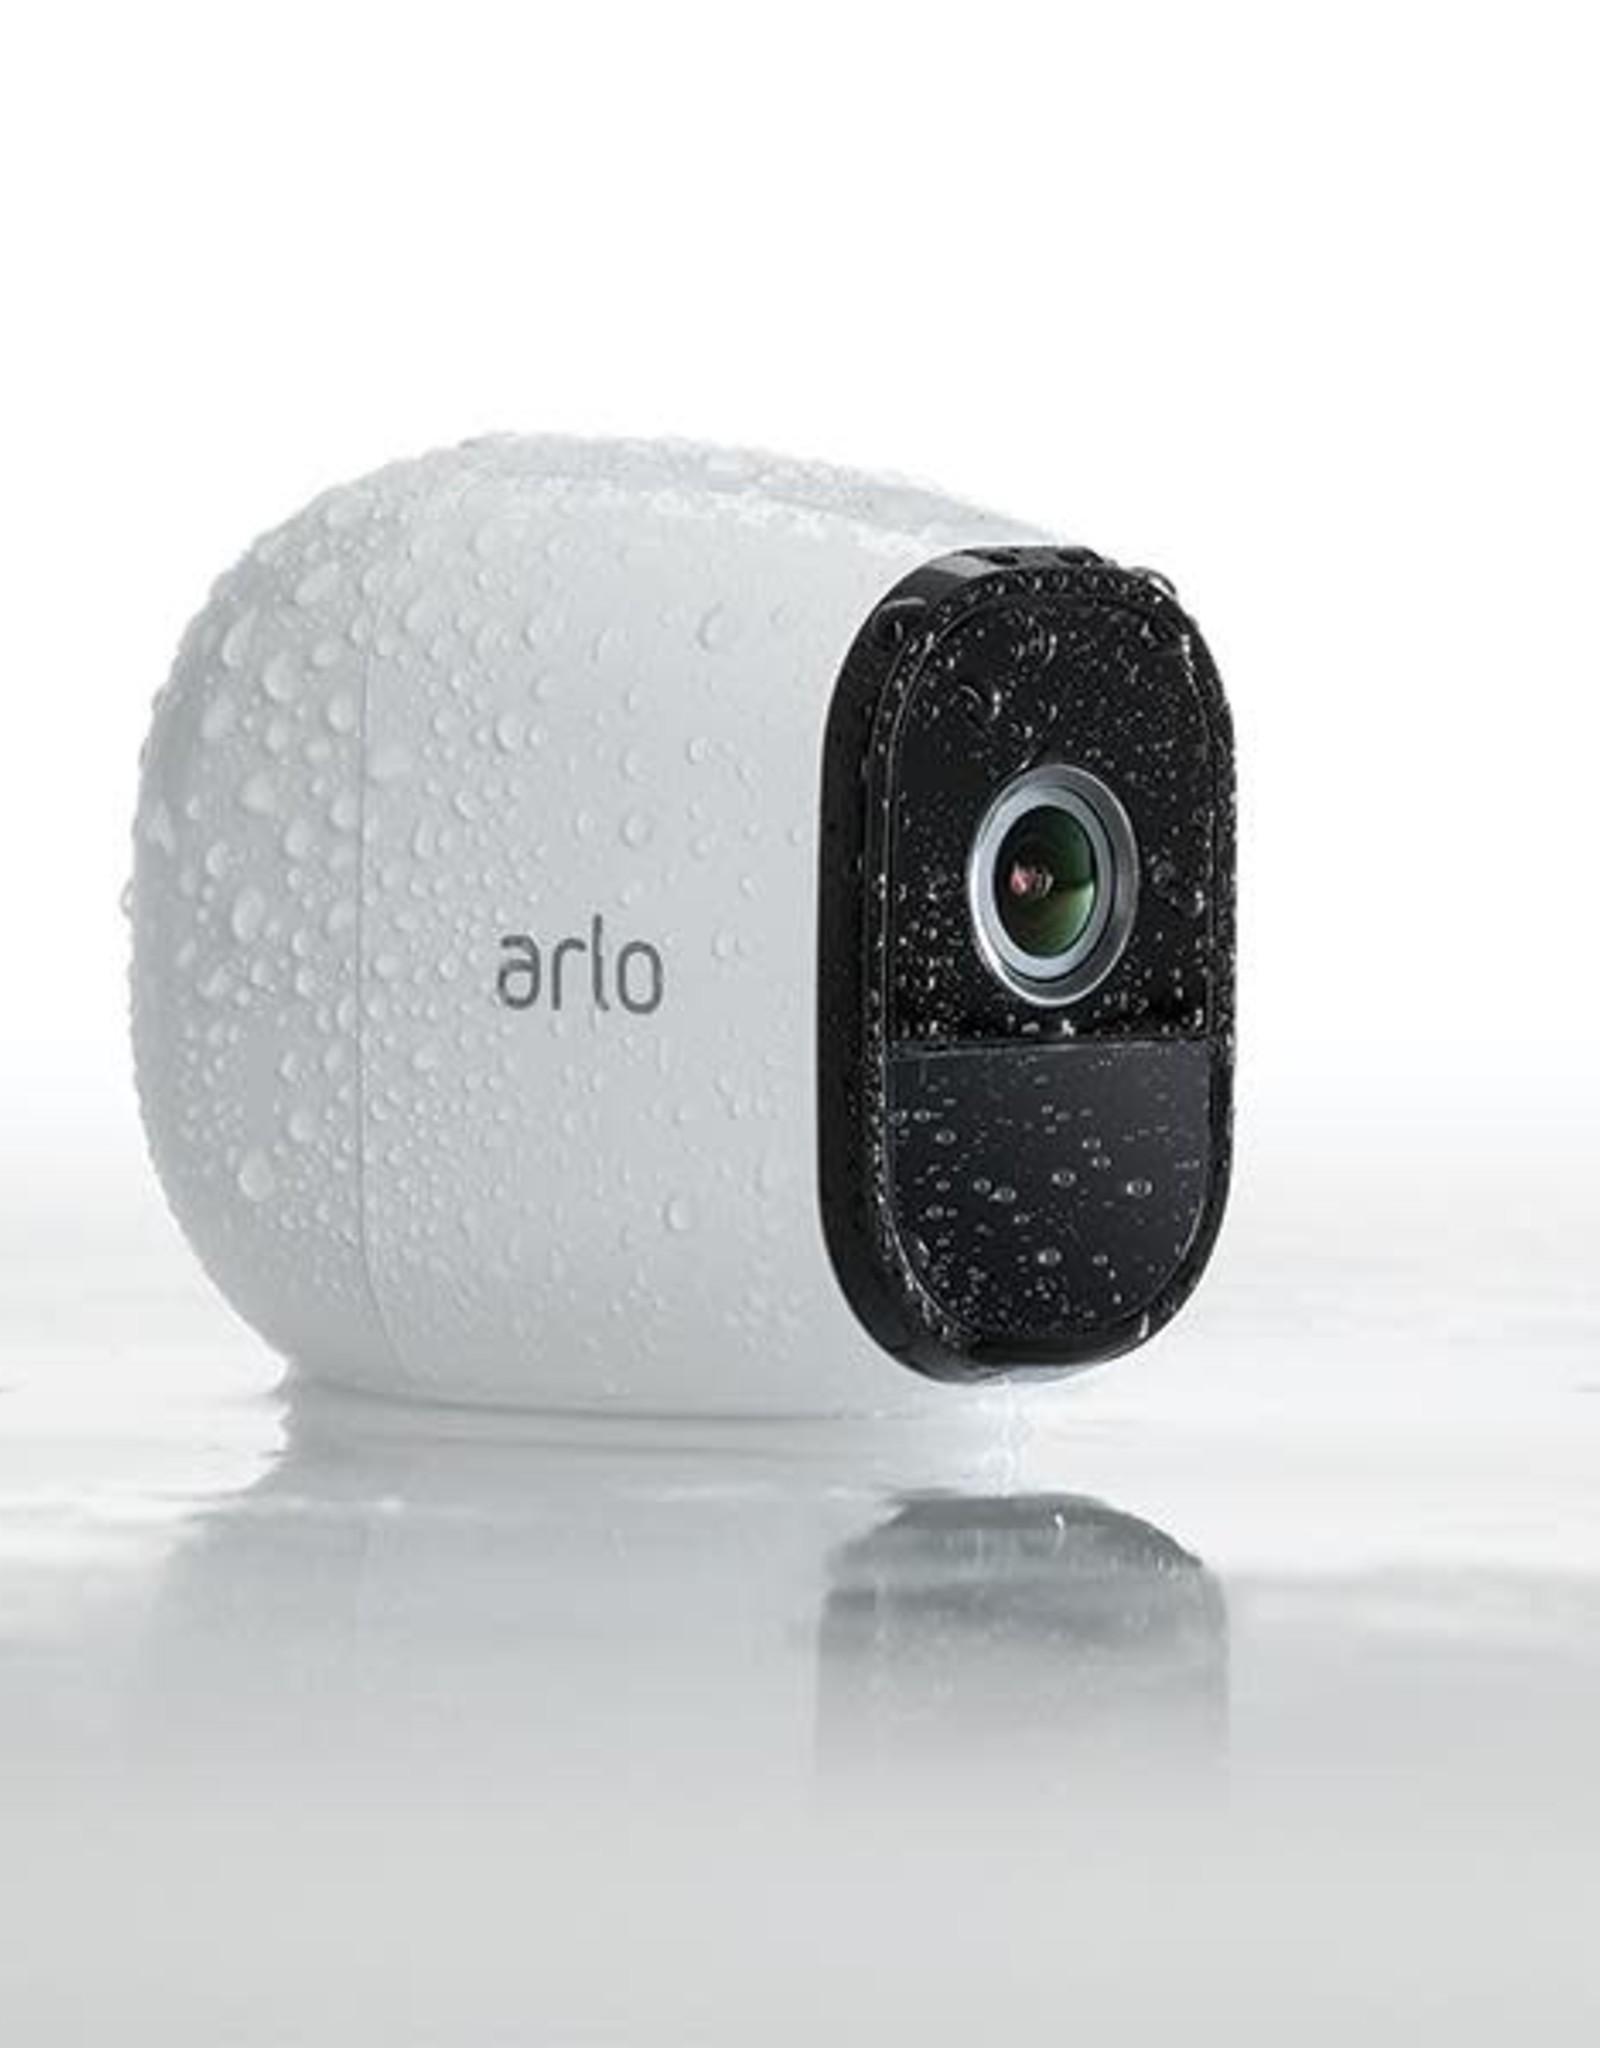 Arlo Arlo pro 2 add-on wire-free camera